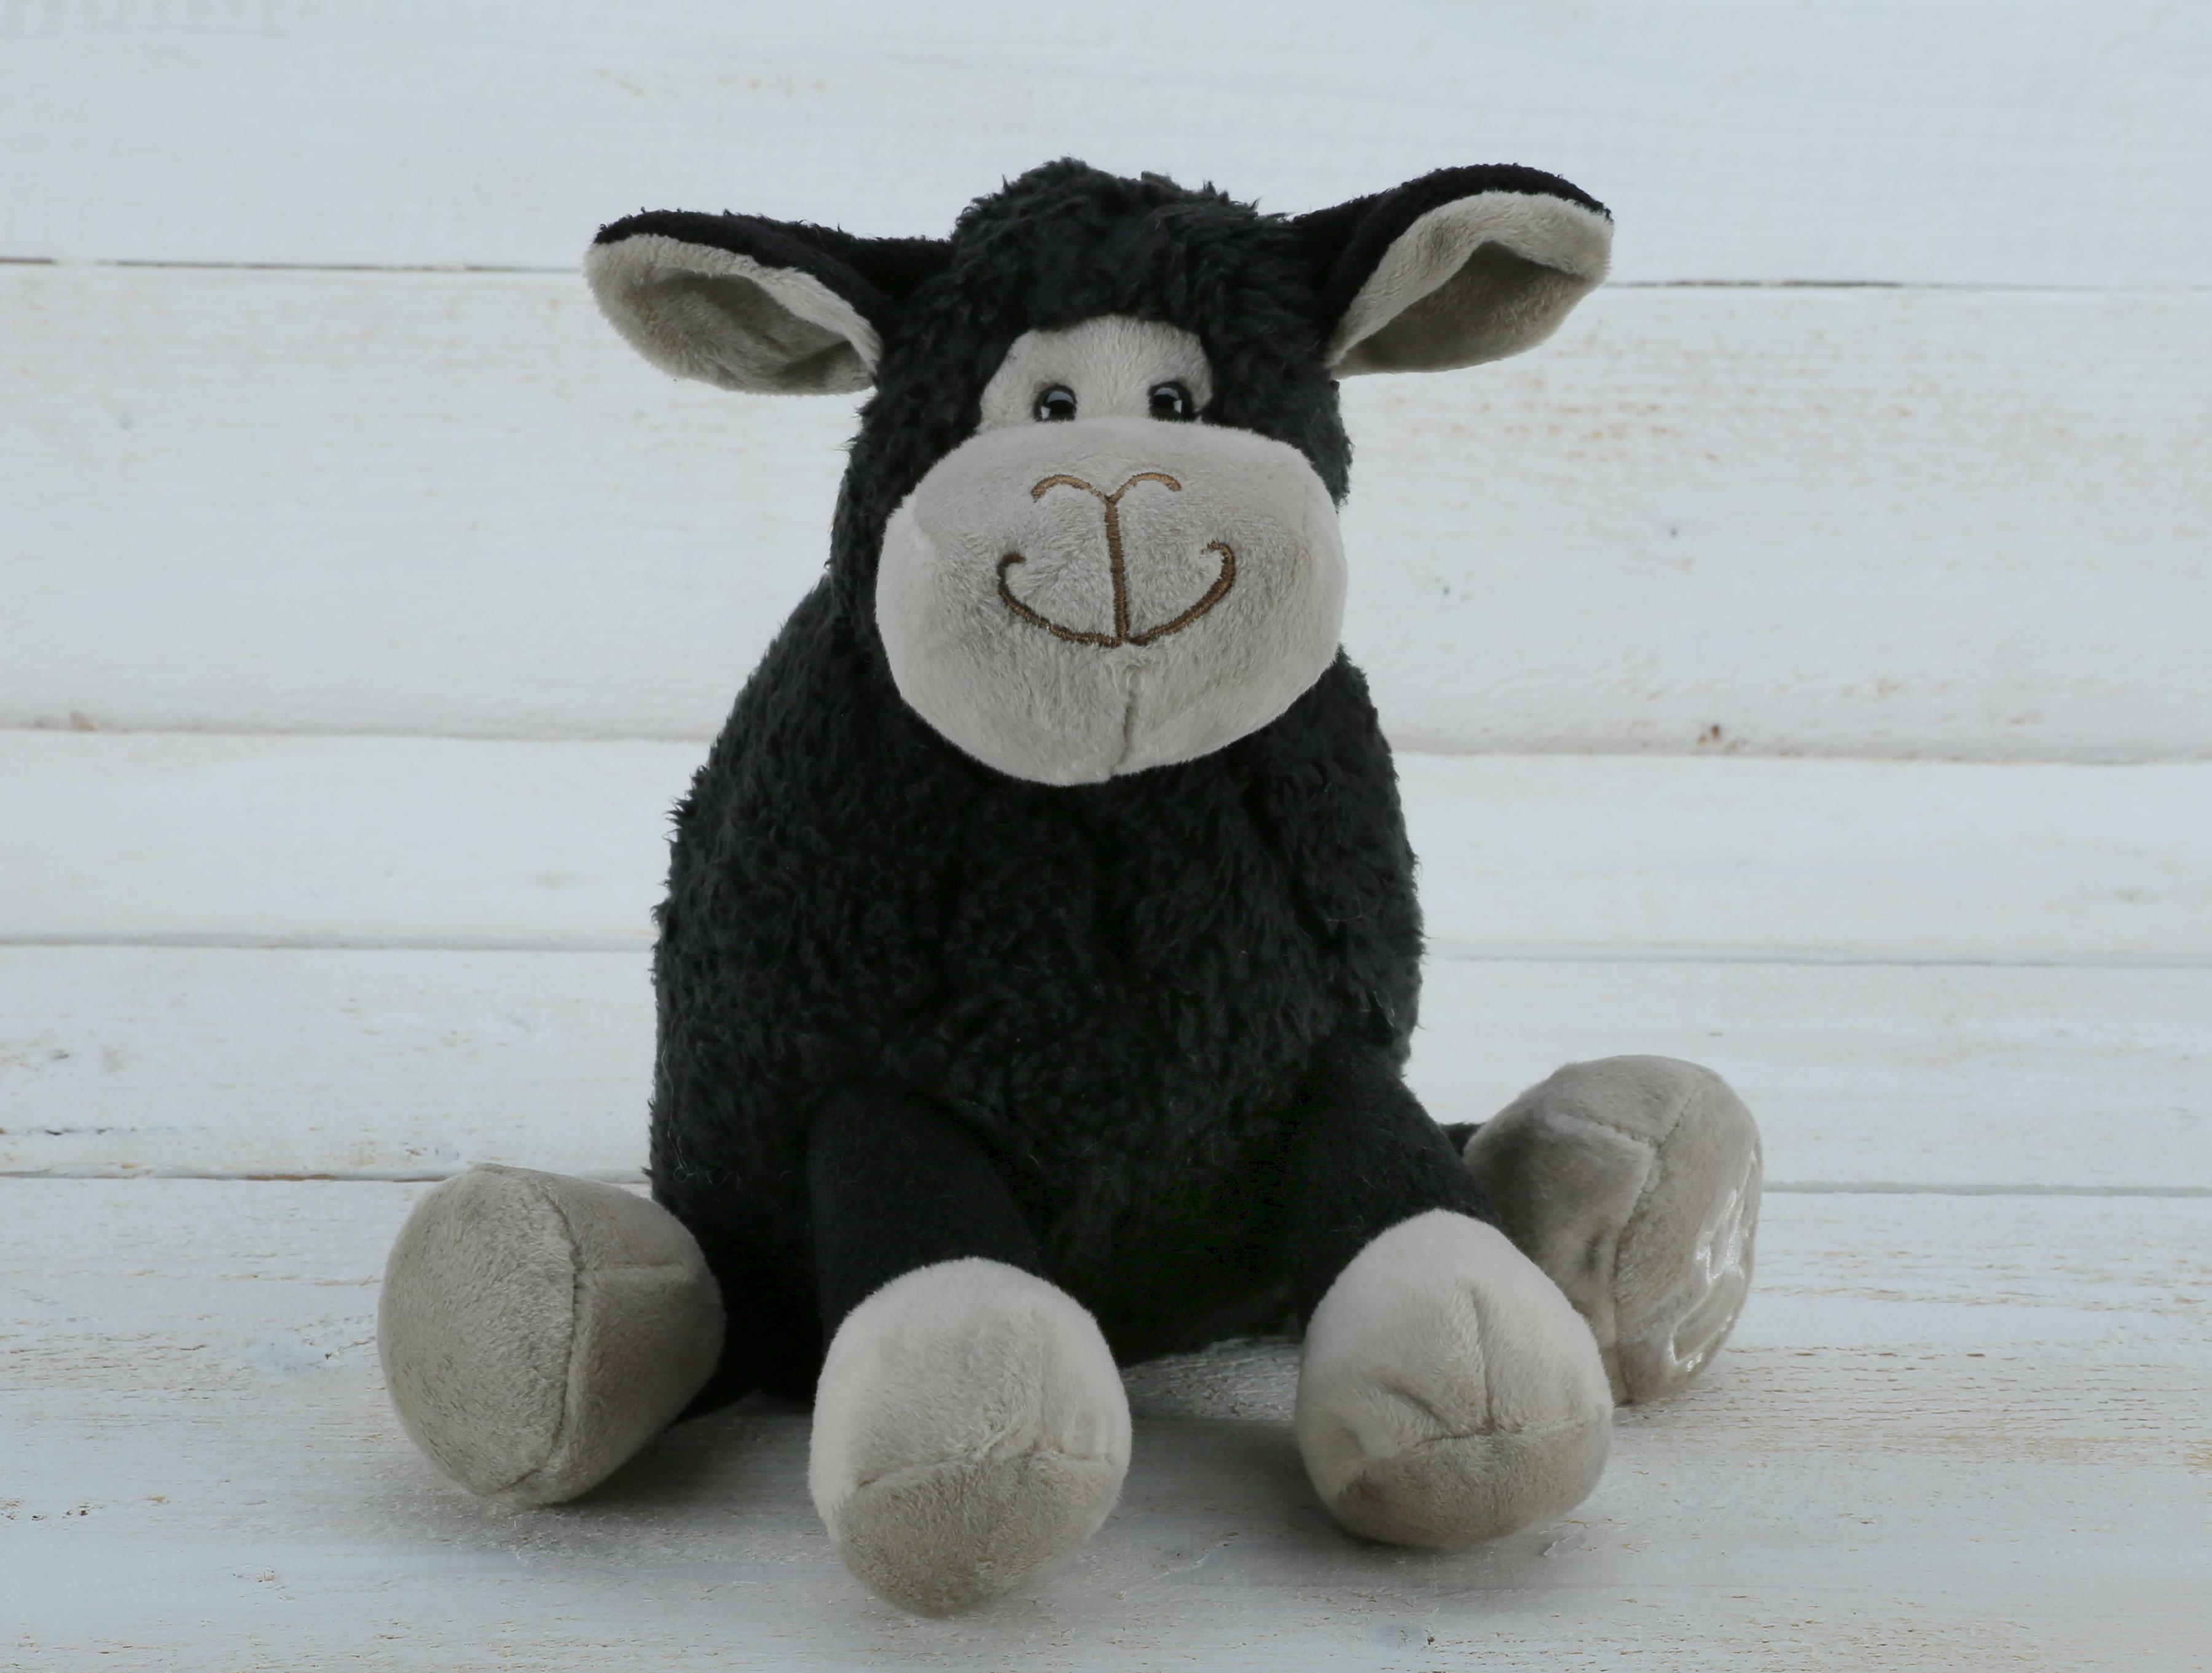 SMALL BLACK SITTING SHEEP JOMANDA